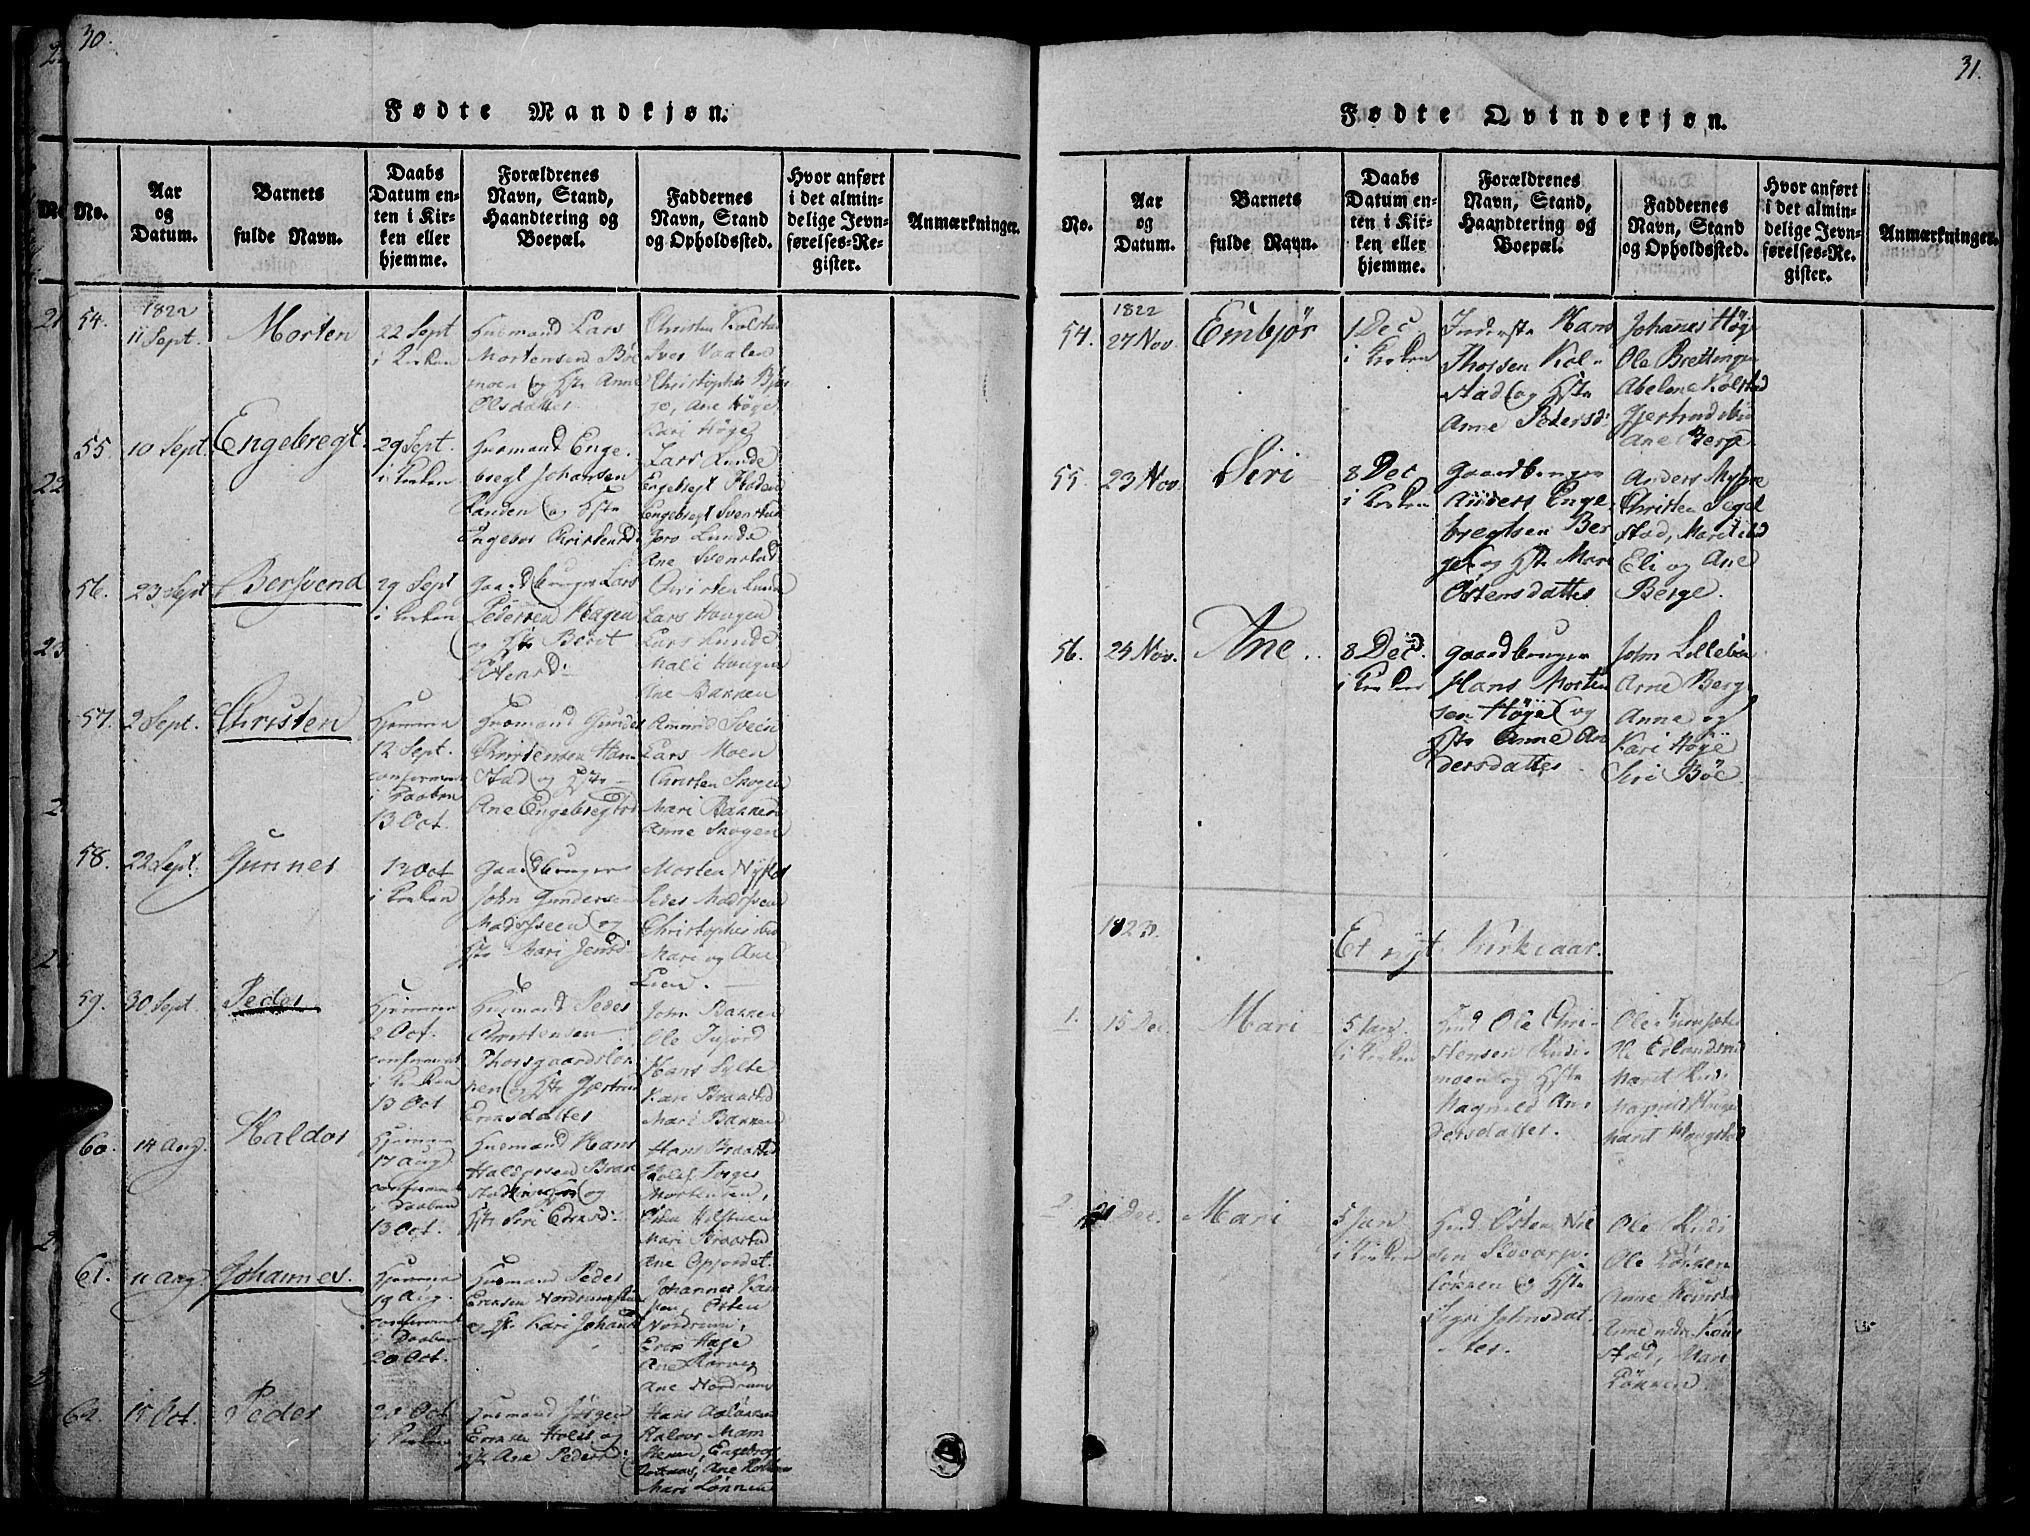 SAH, Ringebu prestekontor, Ministerialbok nr. 4, 1821-1839, s. 30-31